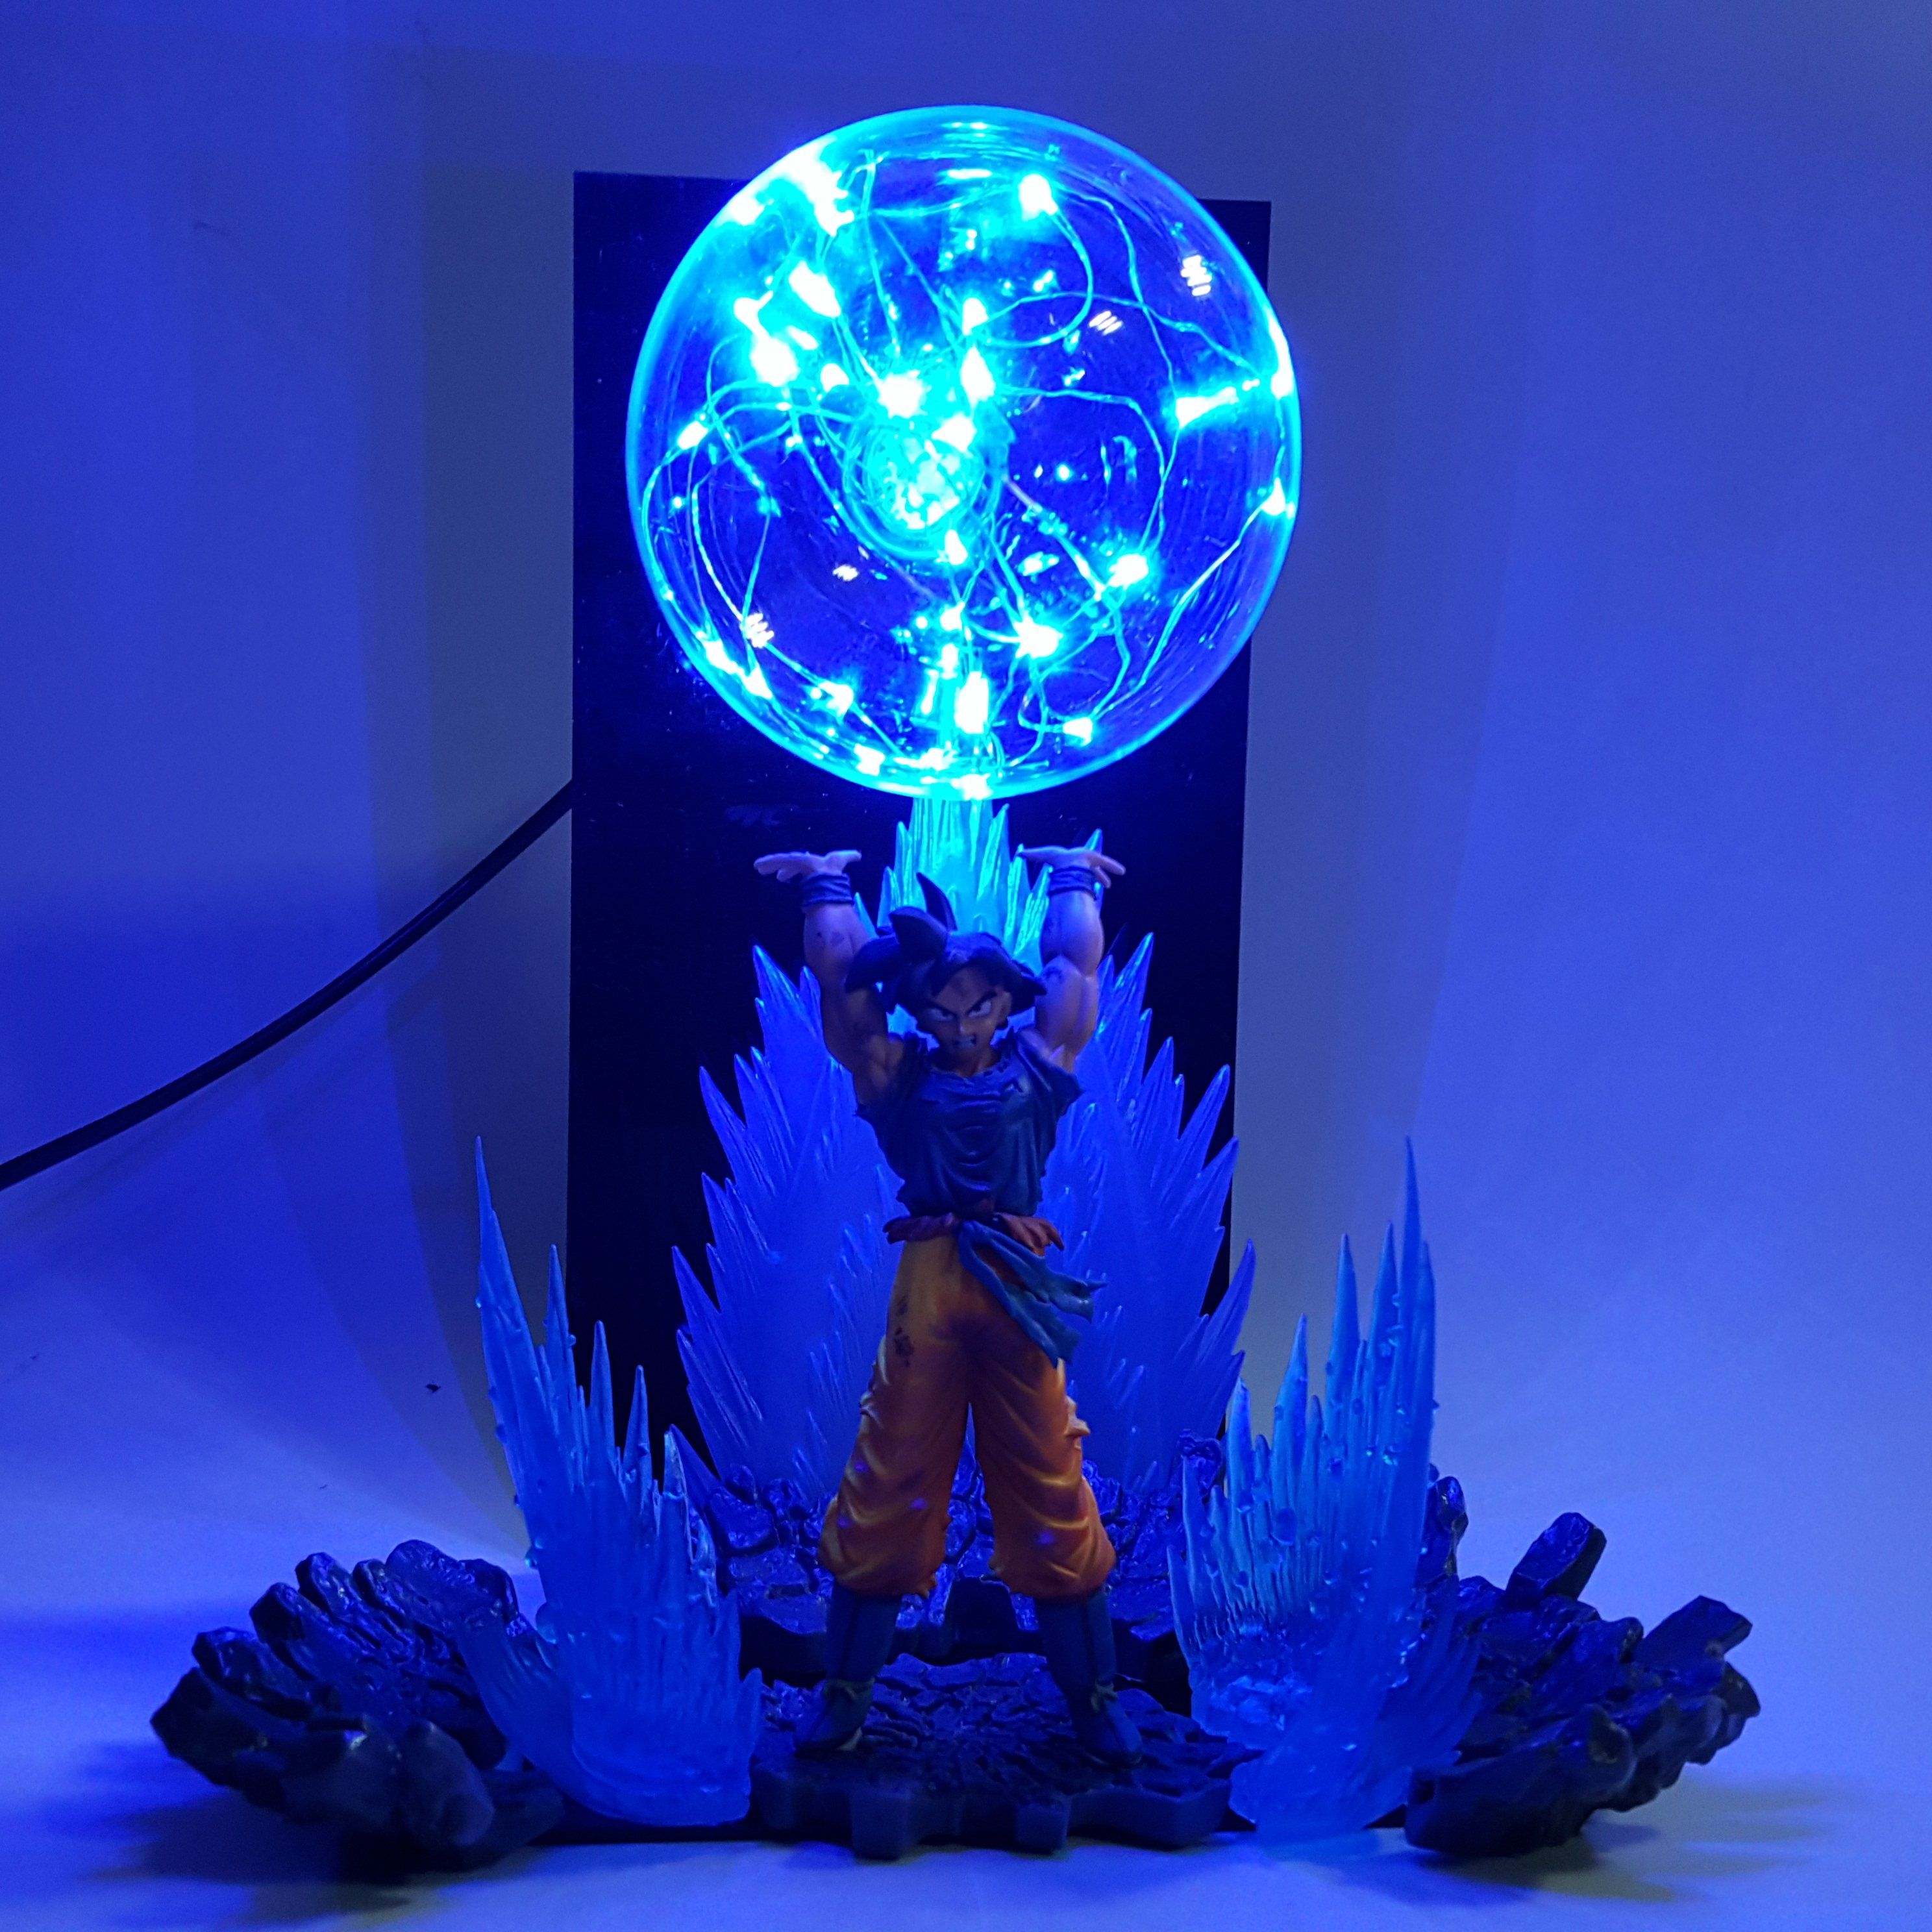 Led Lamps Hot Sale Dragon Ball Z Golden Shenron Crystal Ball Diy Led Set Dragon Ball Super Son Goku Dbz Led Lamp Night Lights Xmas Gift Orders Are Welcome. Led Night Lights